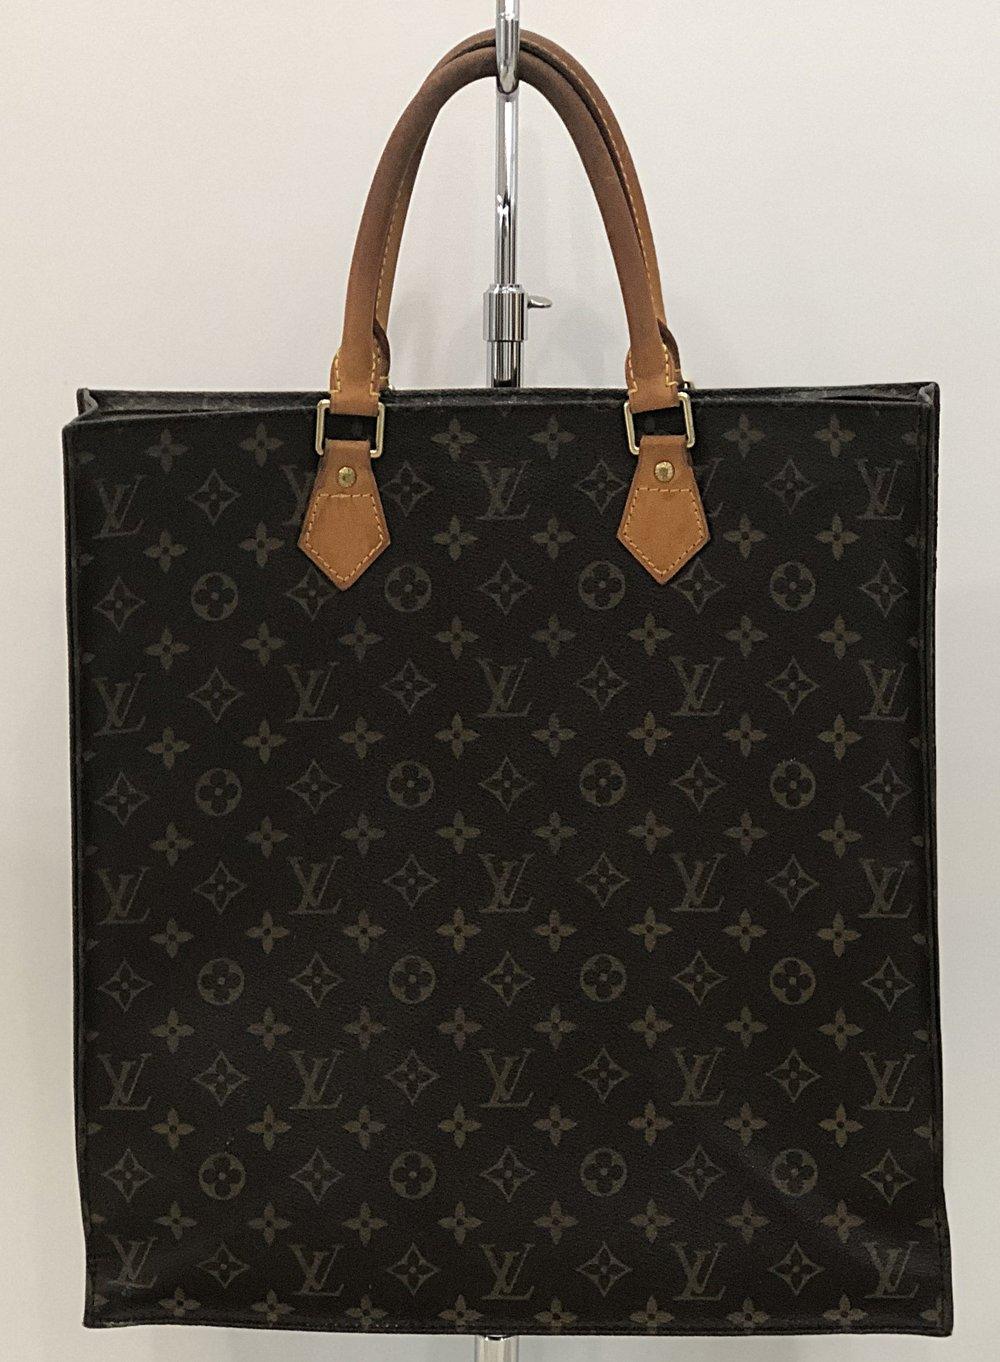 8ebdd249ab Louis Vuitton Monogram Sac Plat — Threads Boutique & Consignment